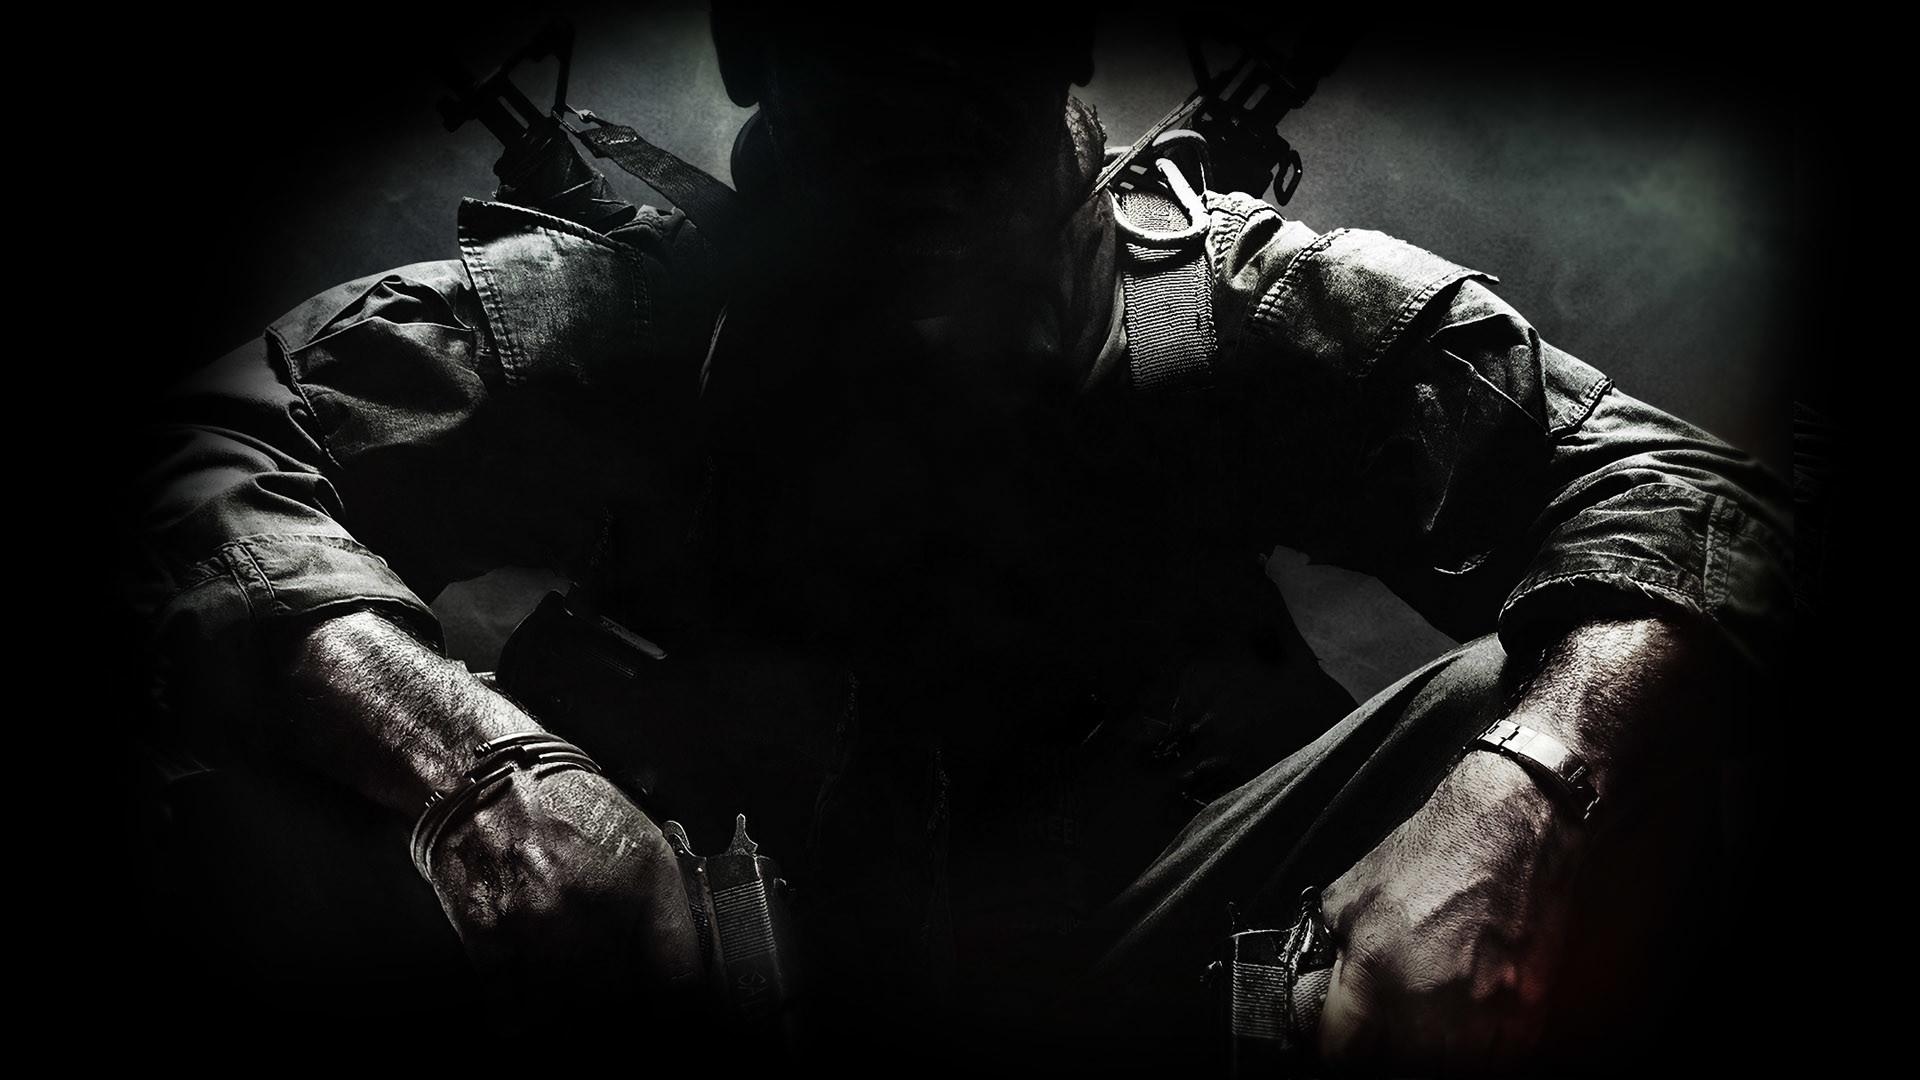 Call of Duty Black Ops 2 Wallpaper (Full HD 1920p) | Download Wallpaper |  Pinterest | Black ops and Wallpaper